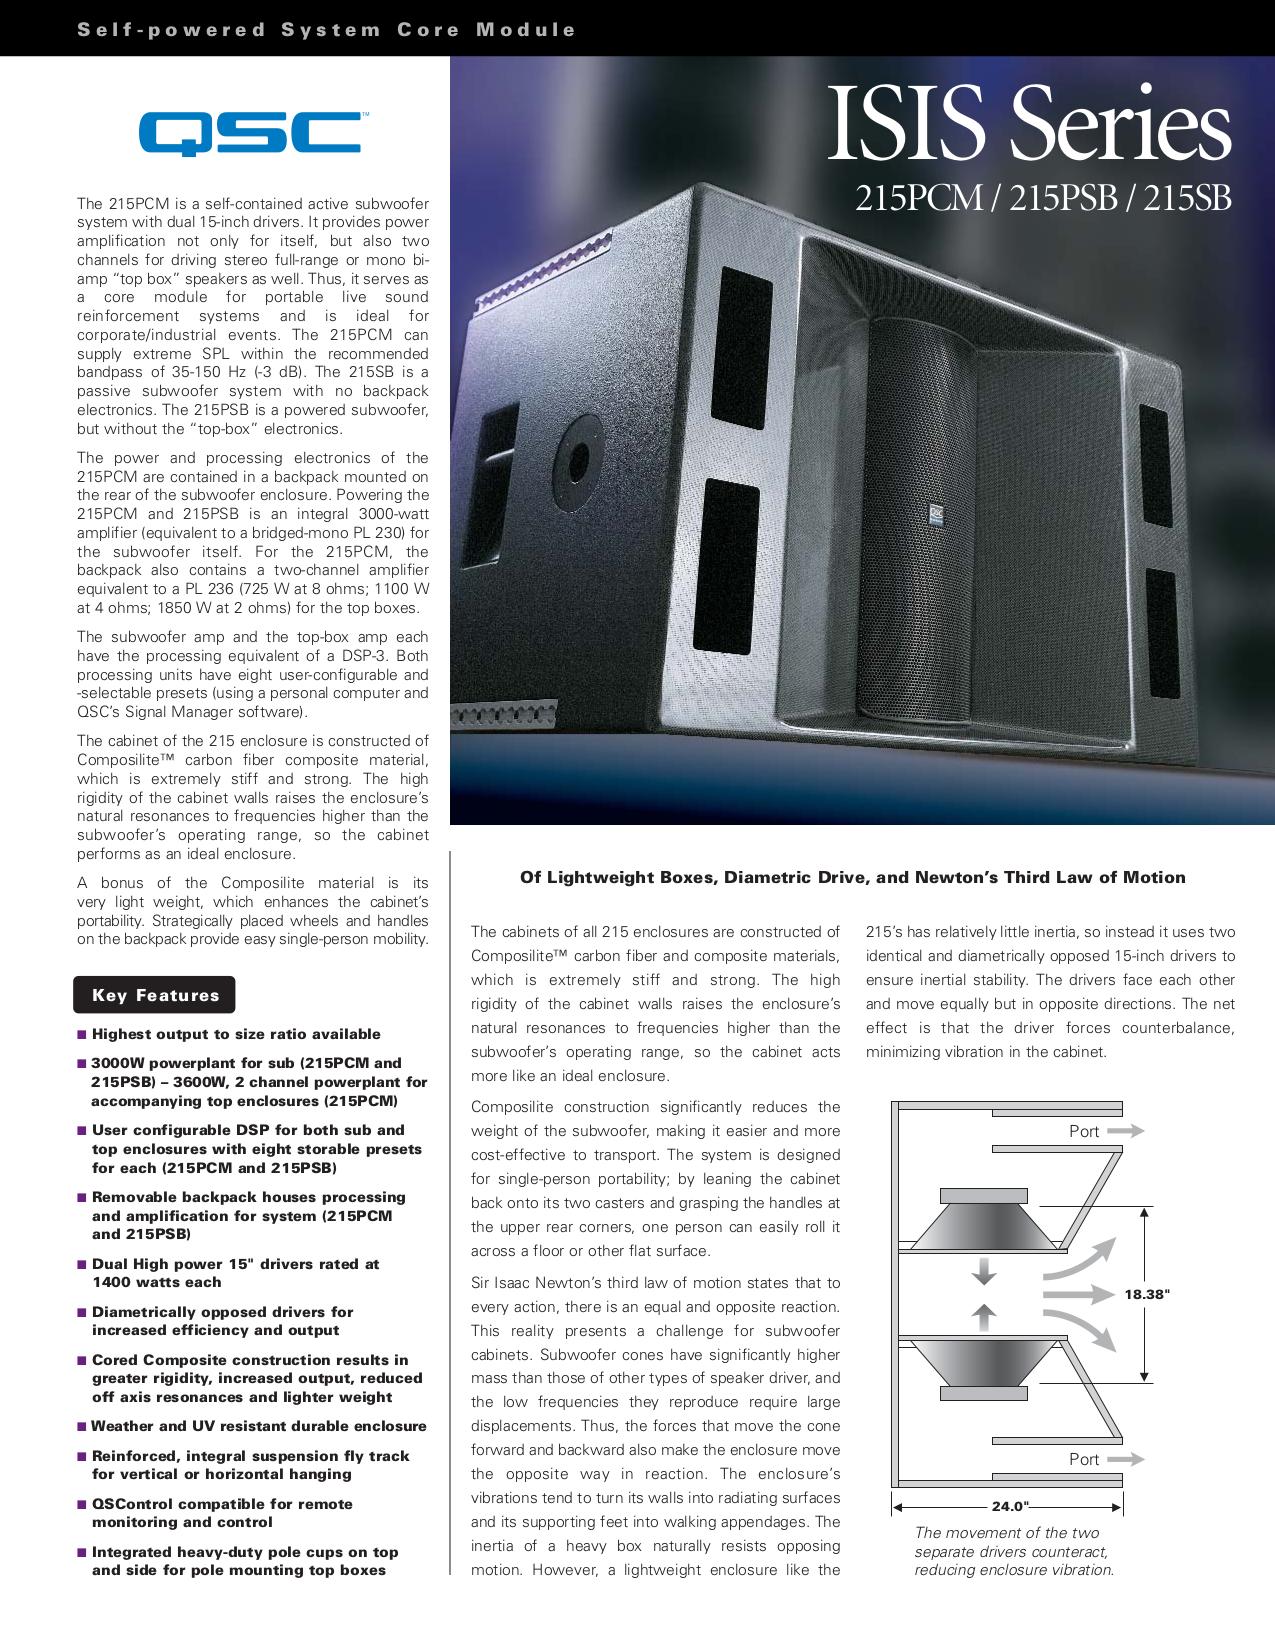 pdf for QSC Subwoofer ISIS 215PCM manual